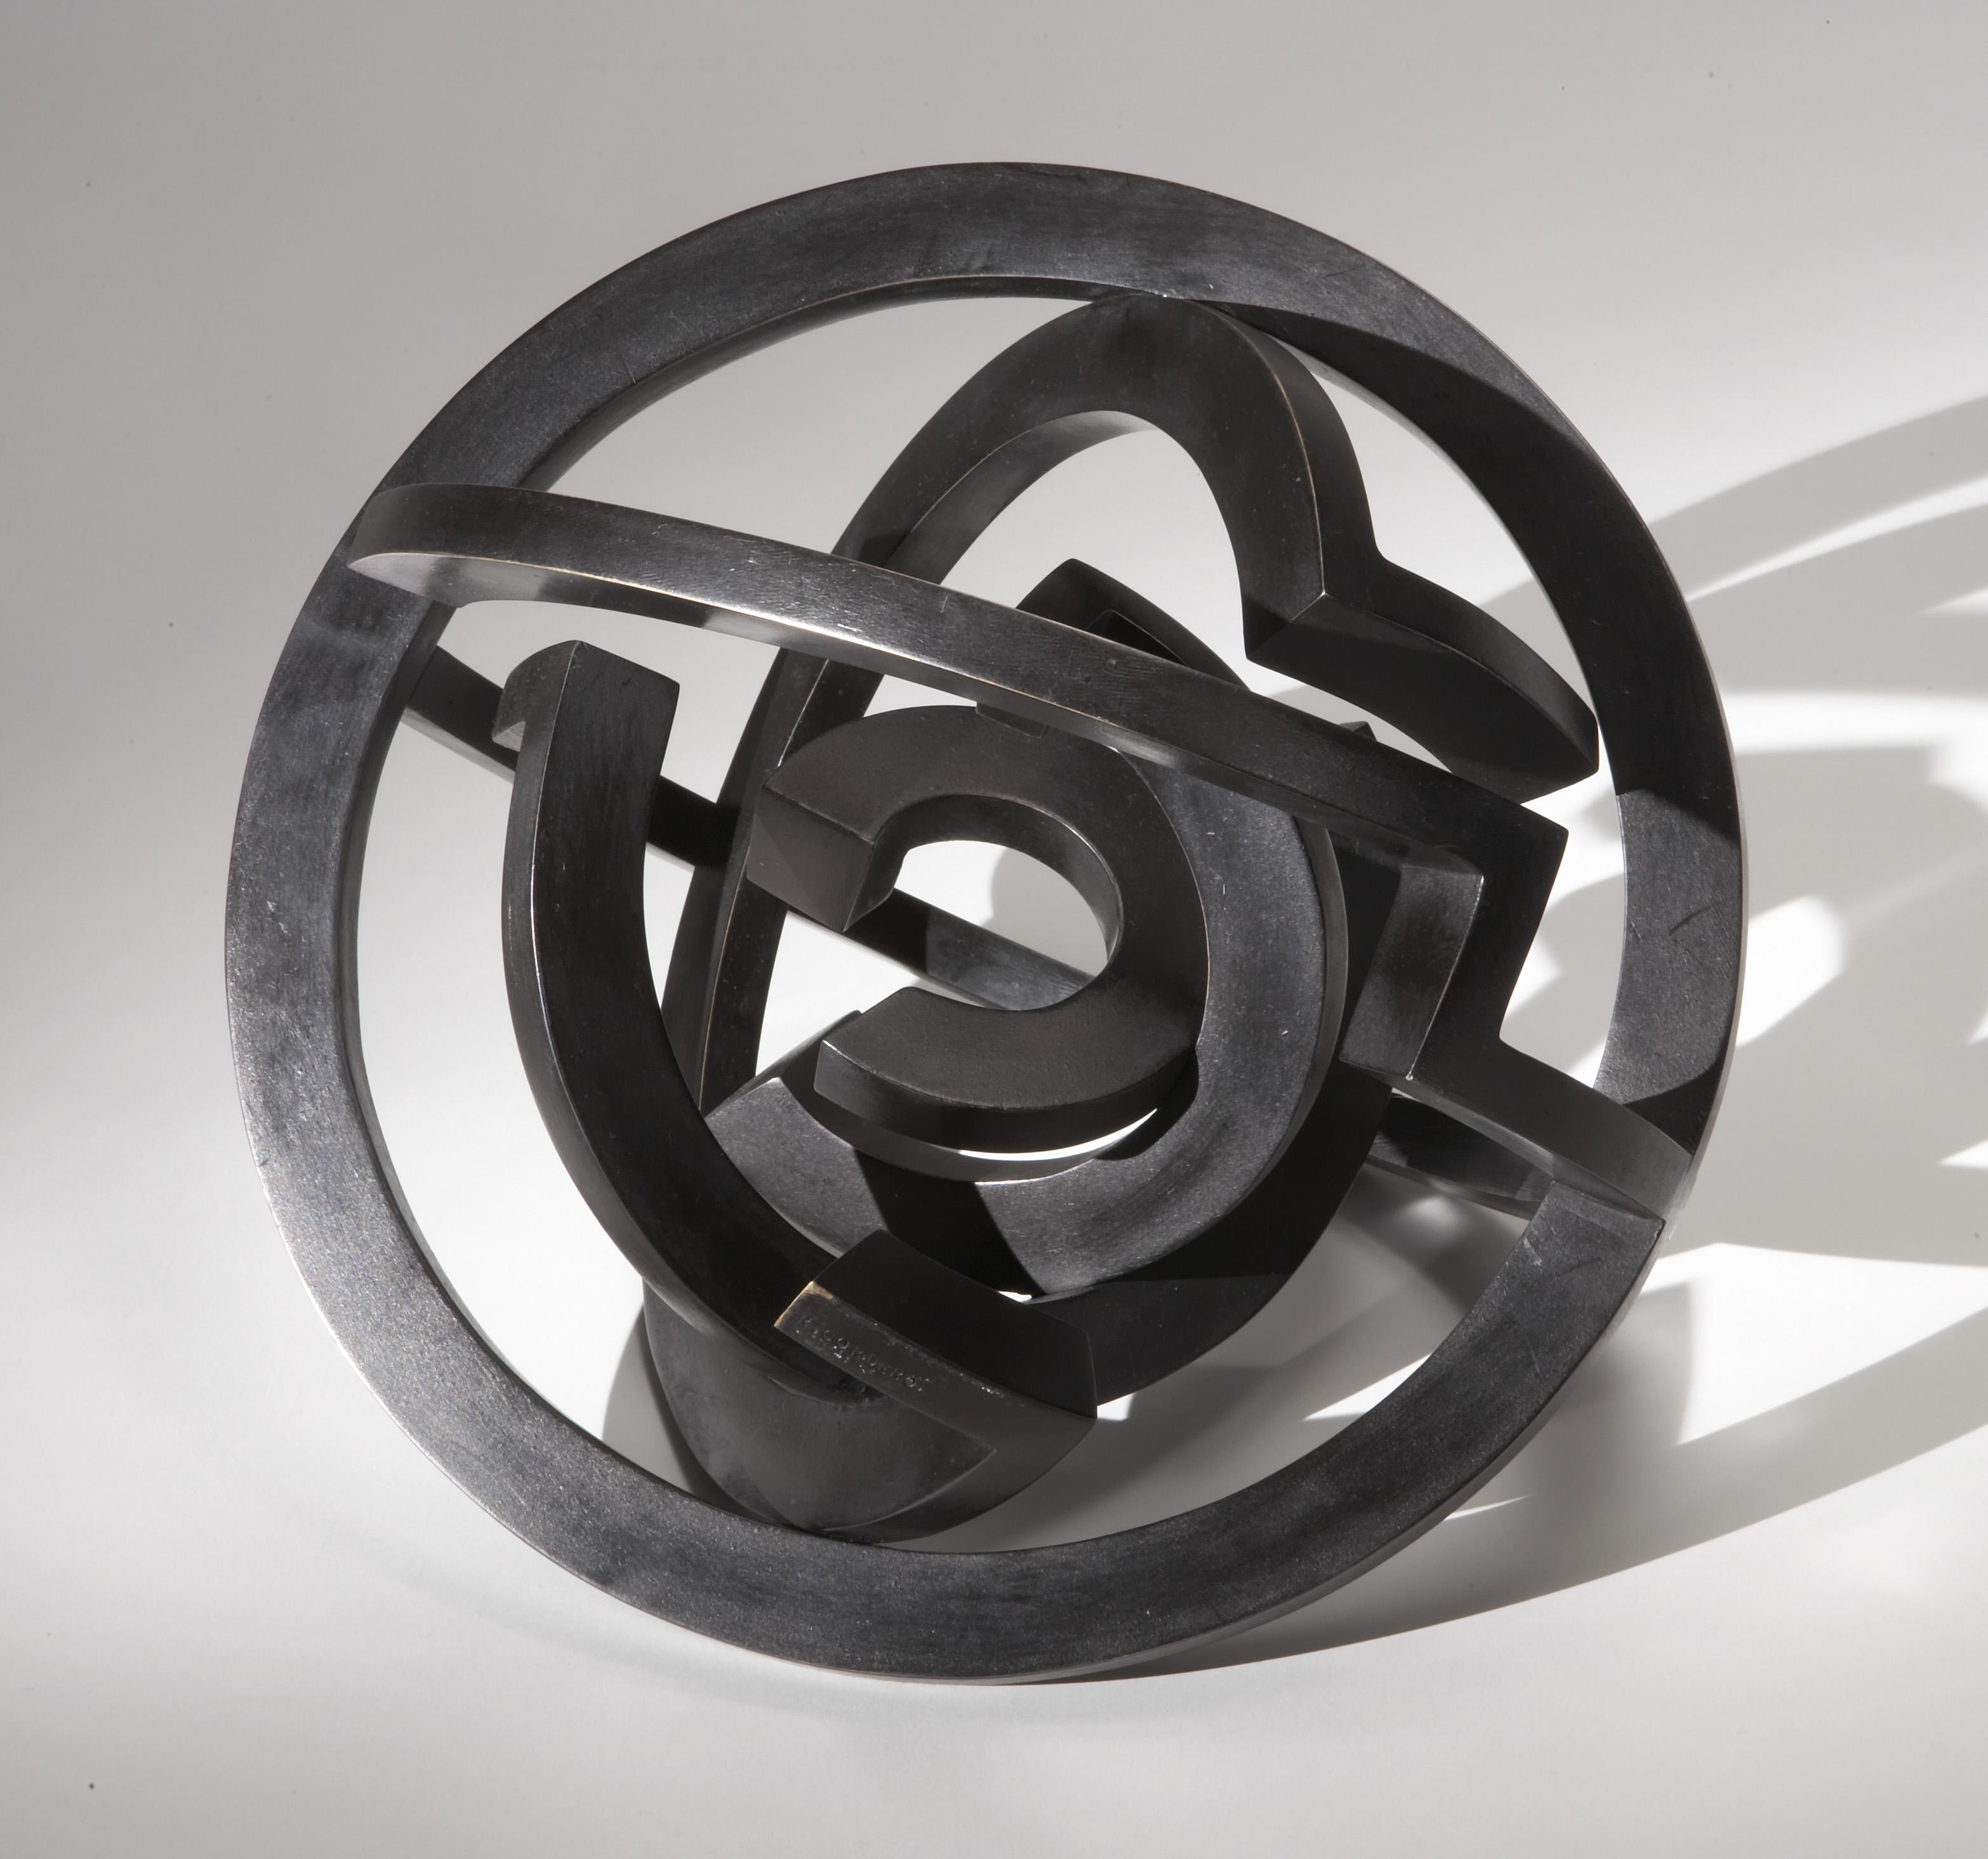 cordero-riccardo-meteora-nera-2005-bronzo-diam-cm-50